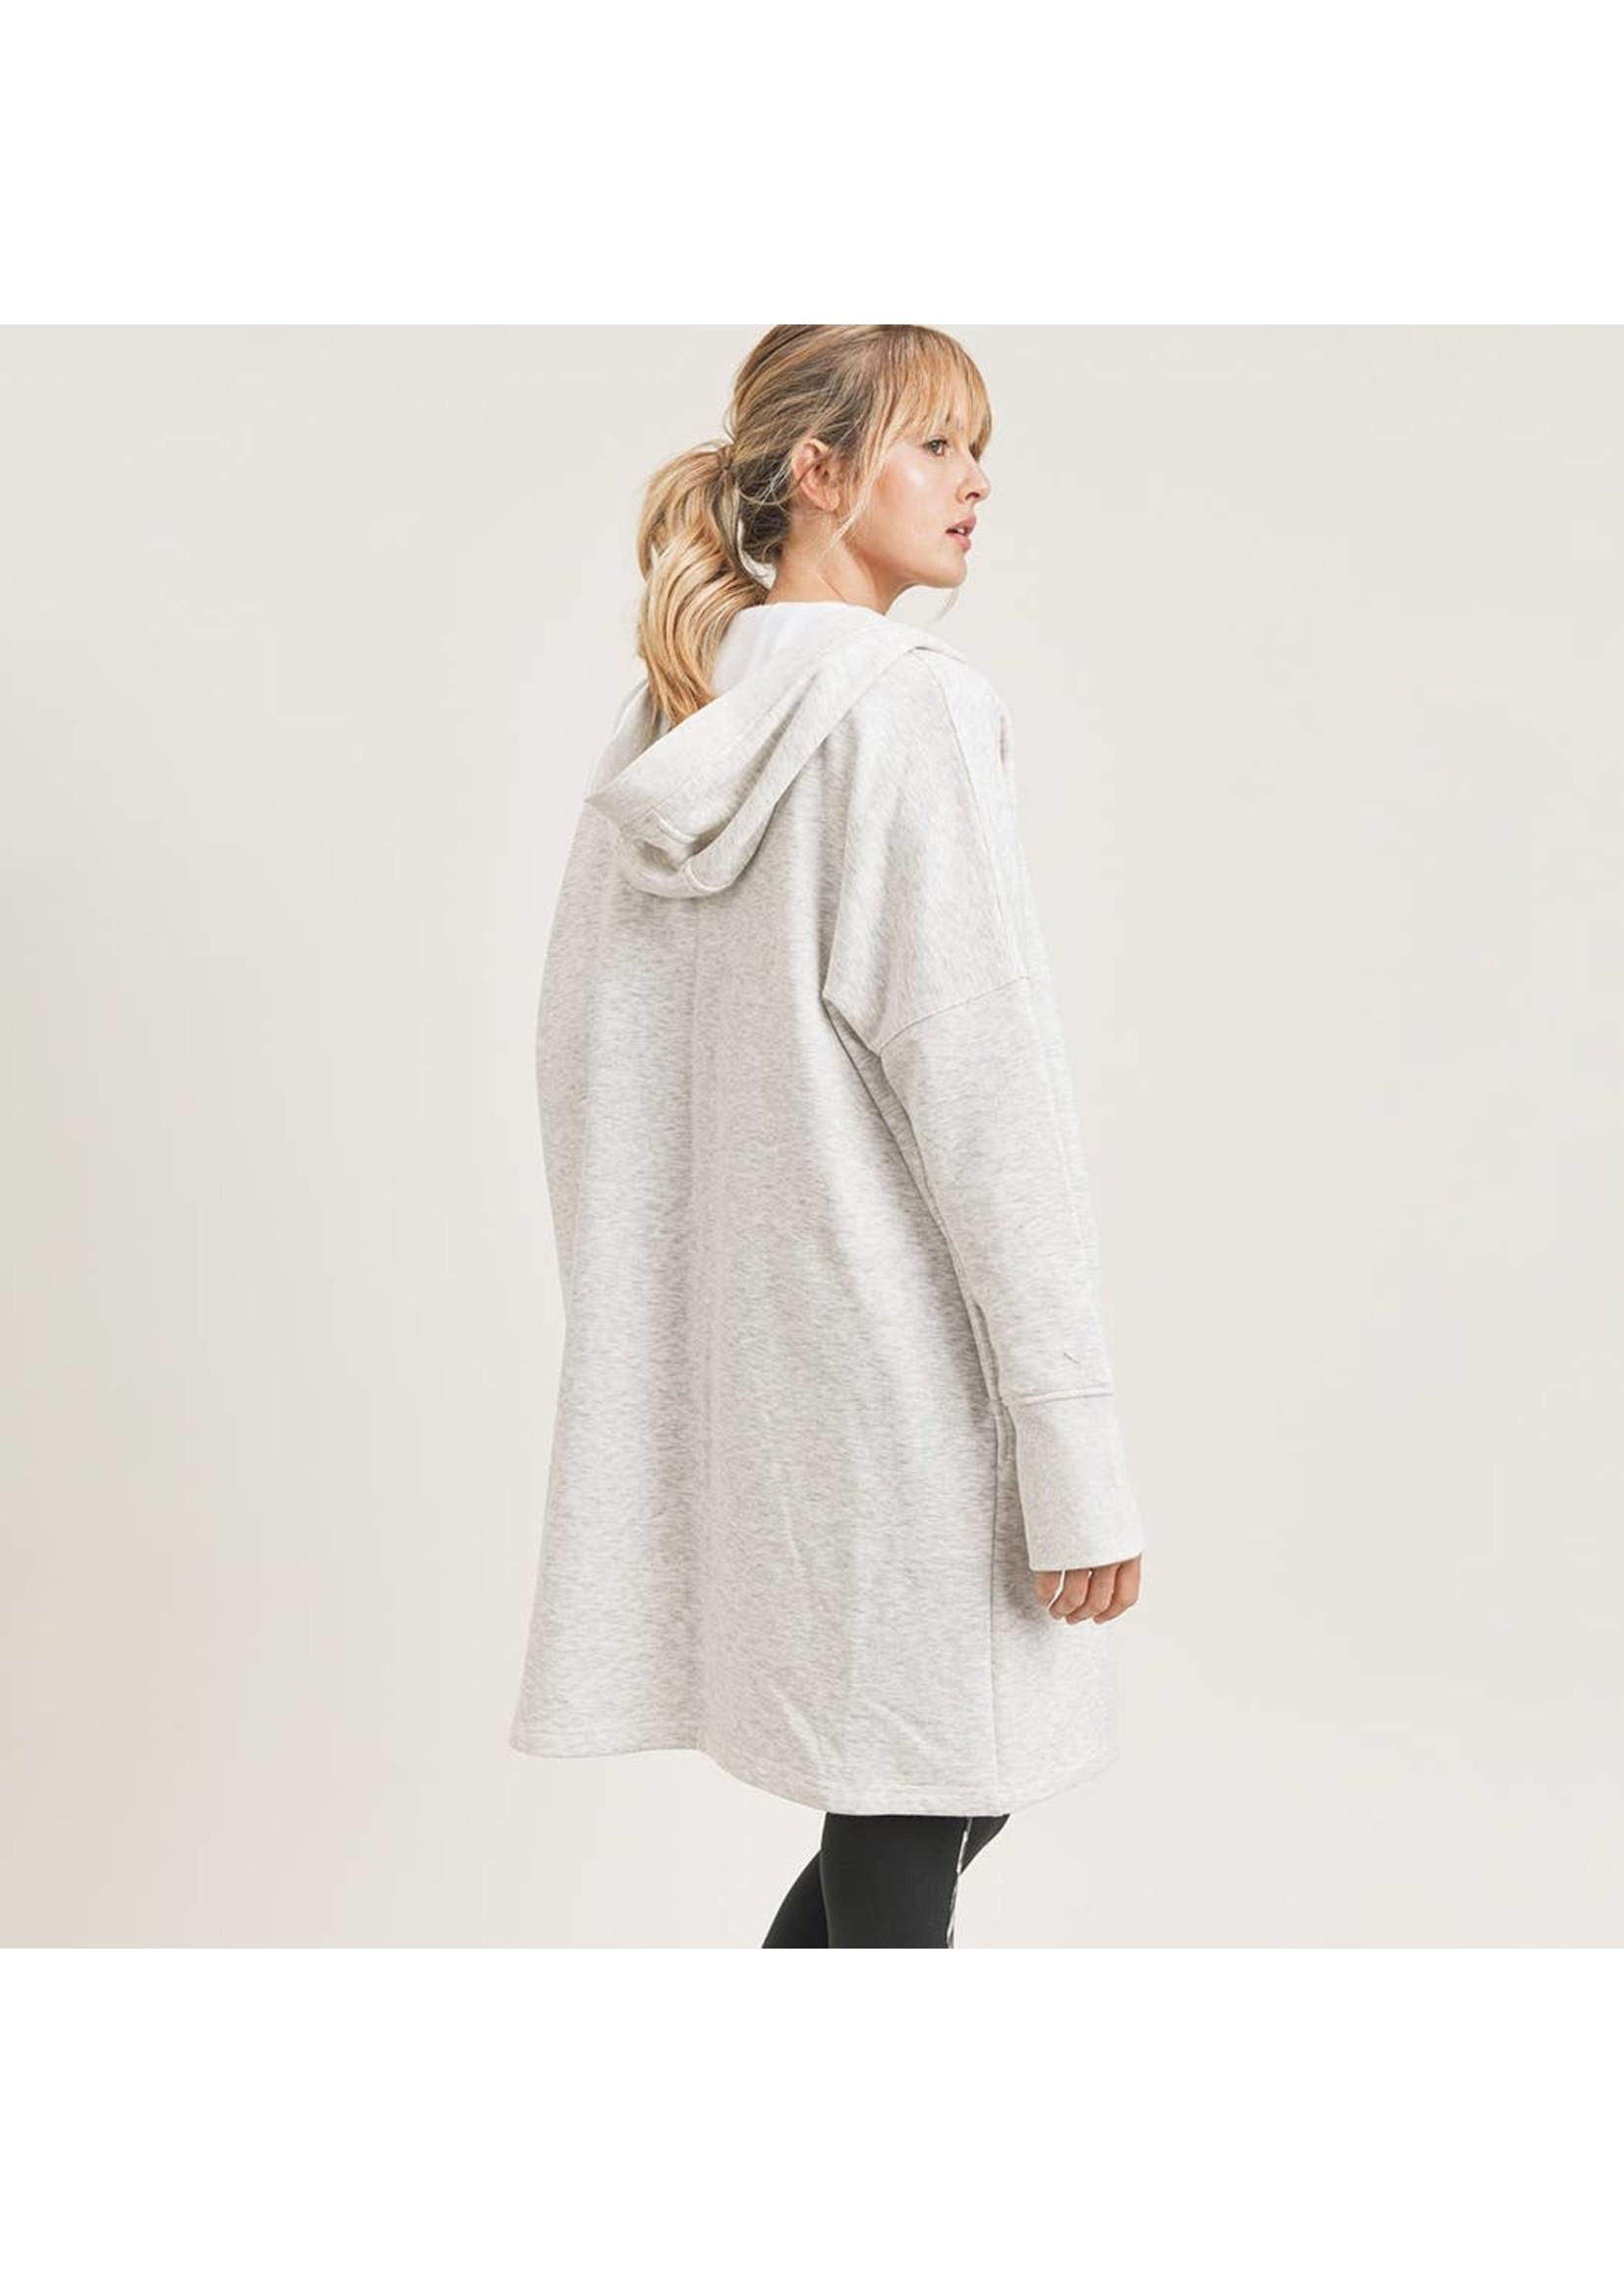 Mono B Open Front Longline Hoodie Cardigan with Fleece Lining